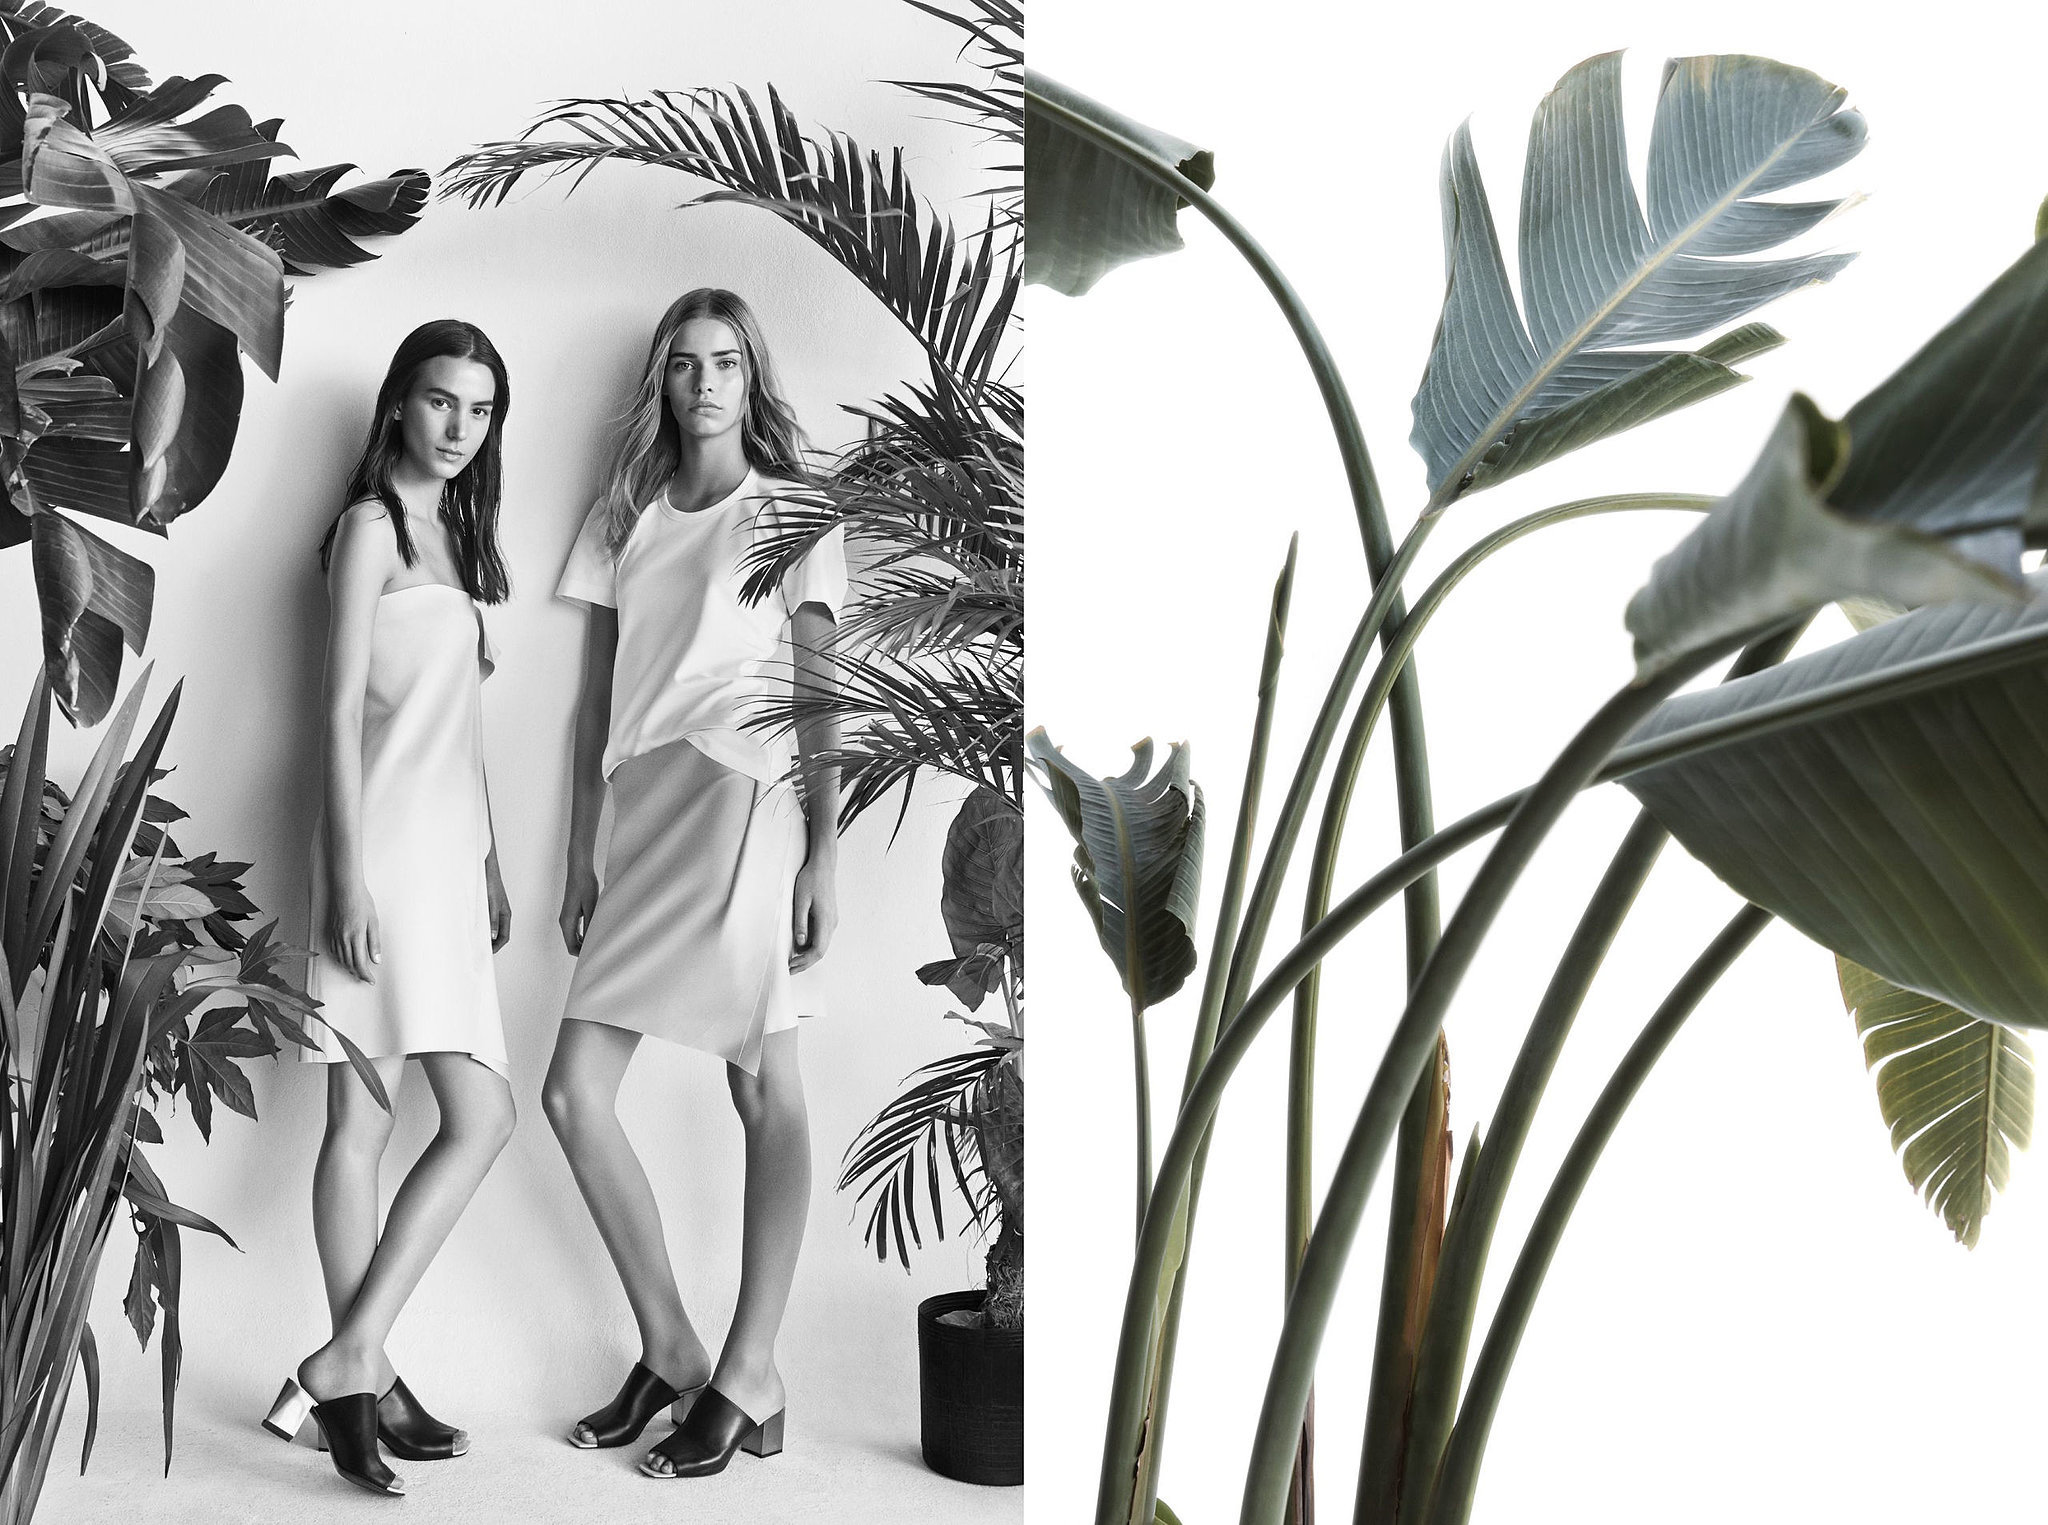 Zara-Spring-2014-Campaign-3